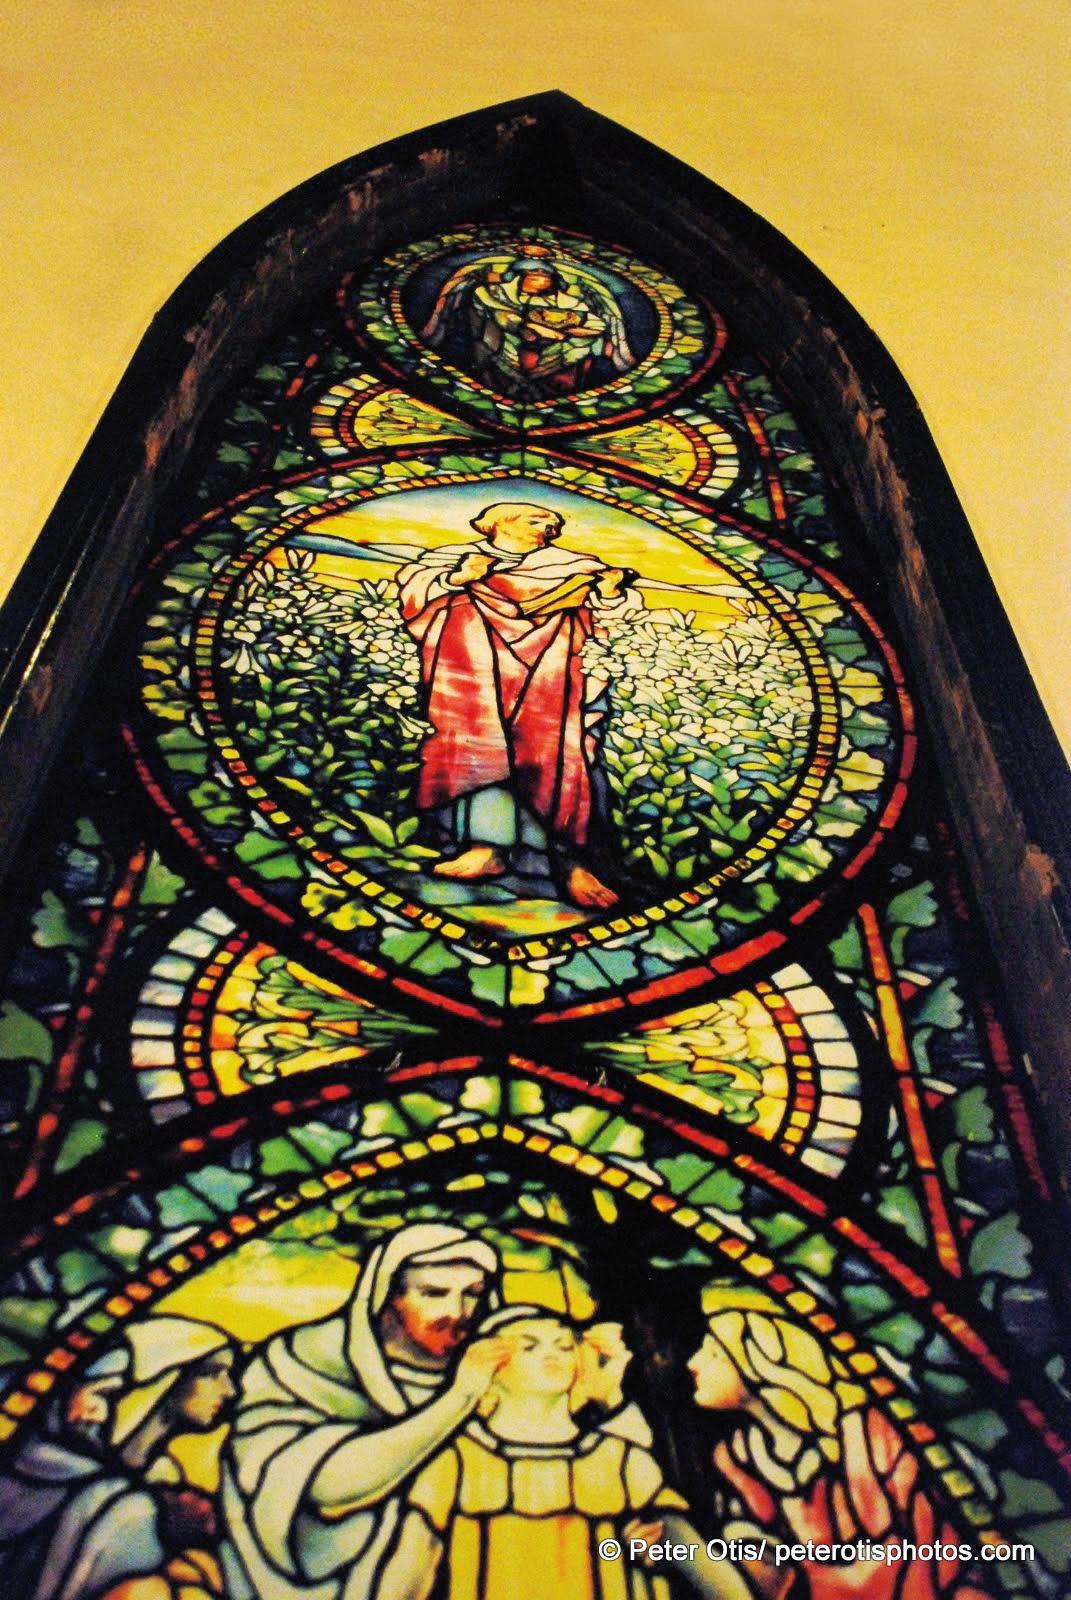 1965 Peter Otis stain glass window photo.jpg